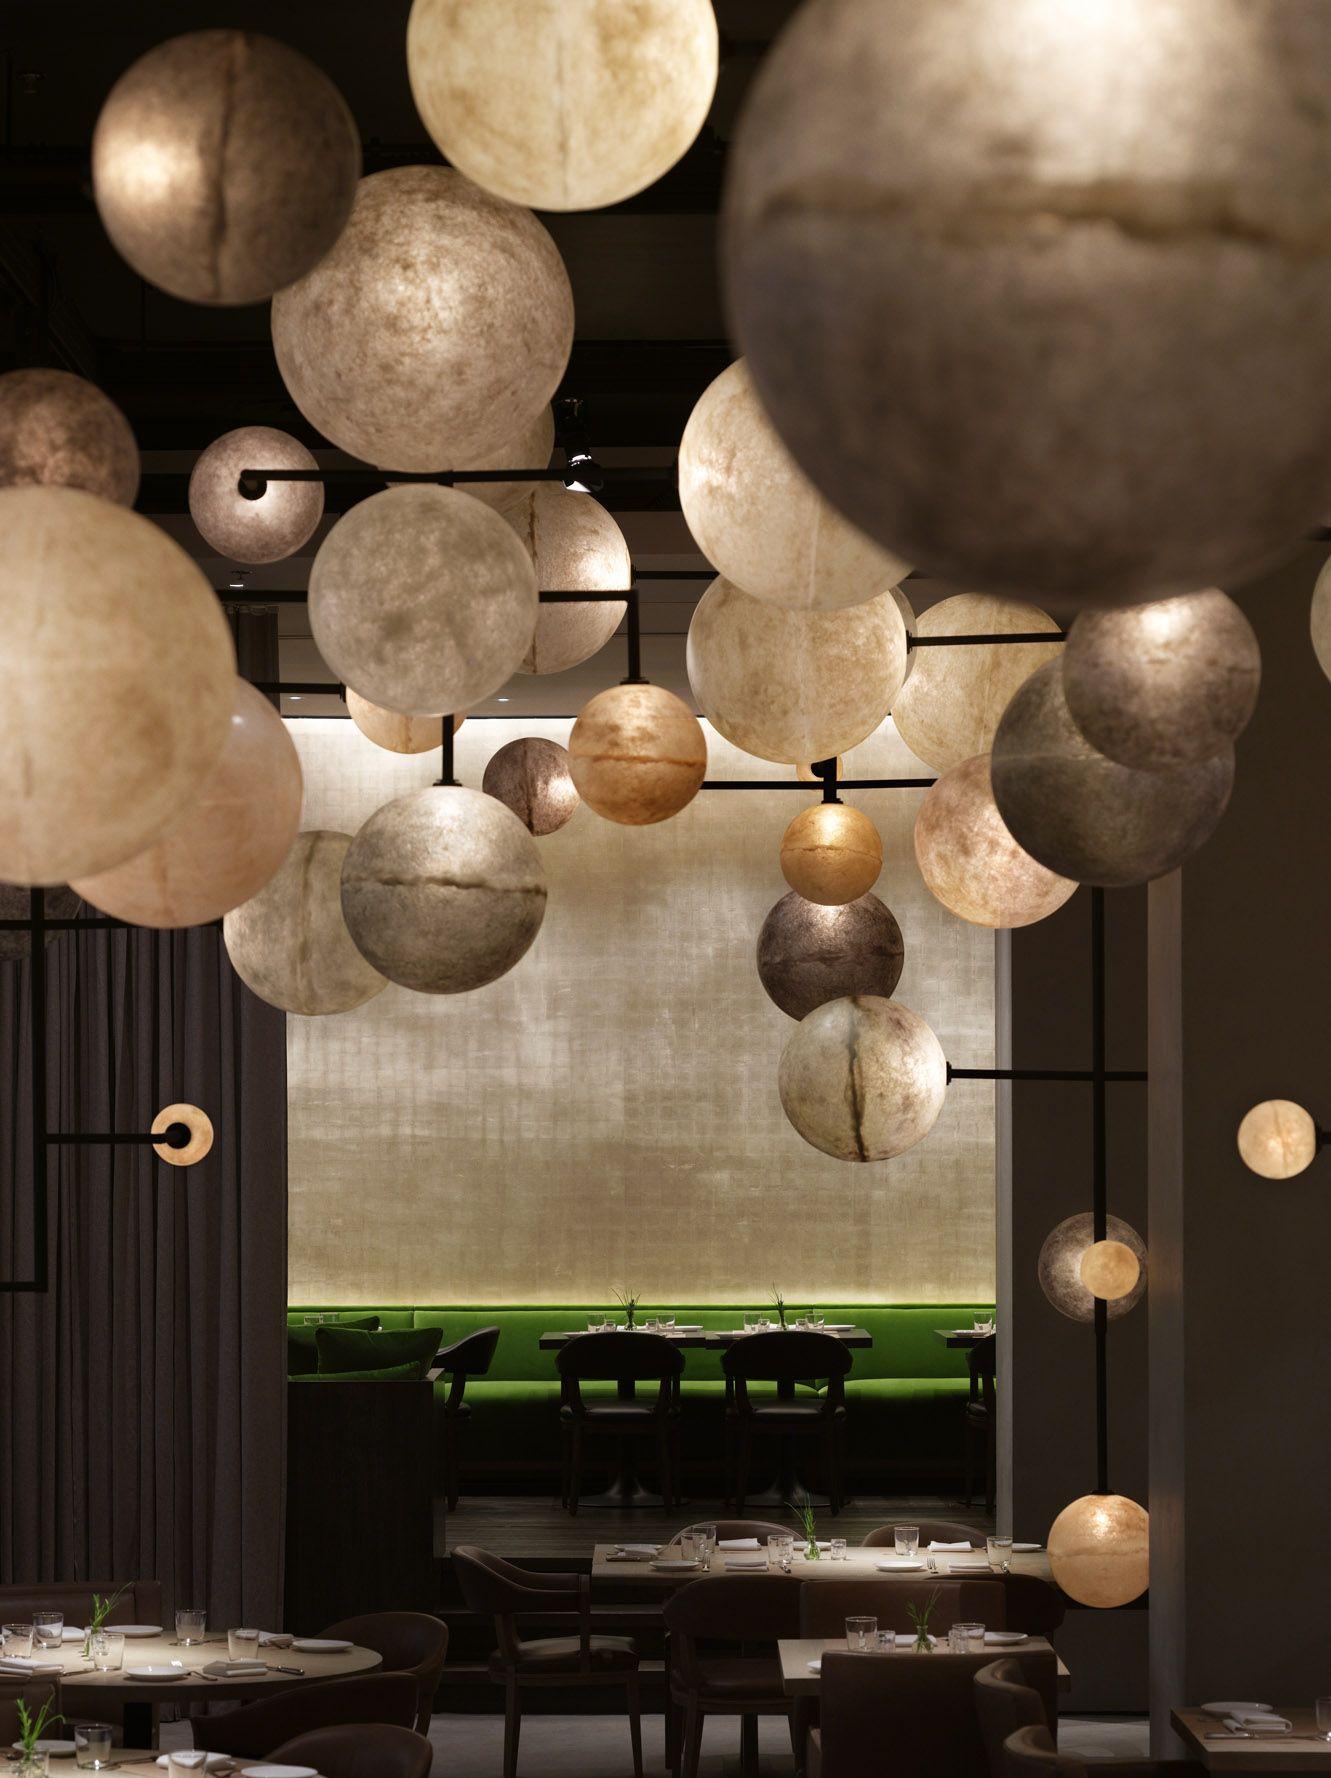 Ian Schrager Goes Public Public hotel, Decor, Restaurant